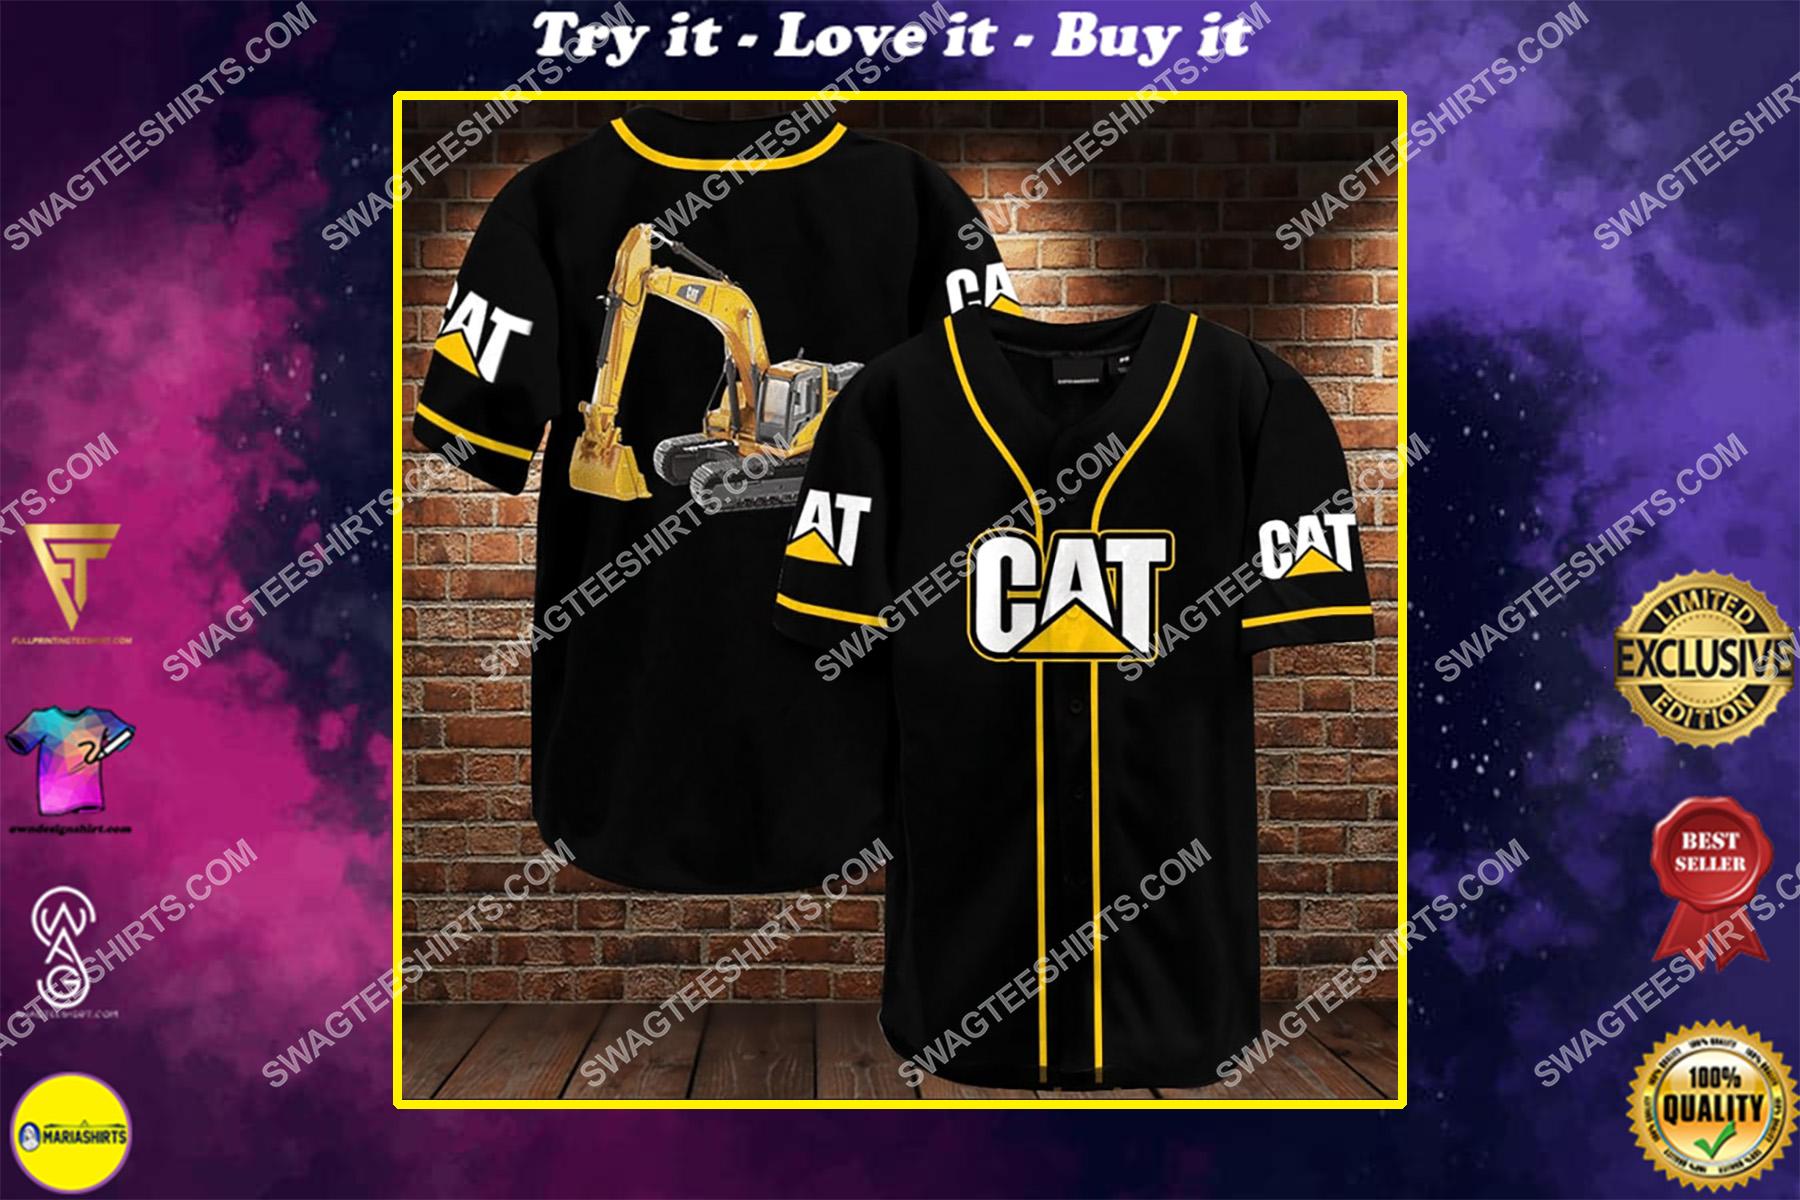 caterpillar all over printed baseball shirt